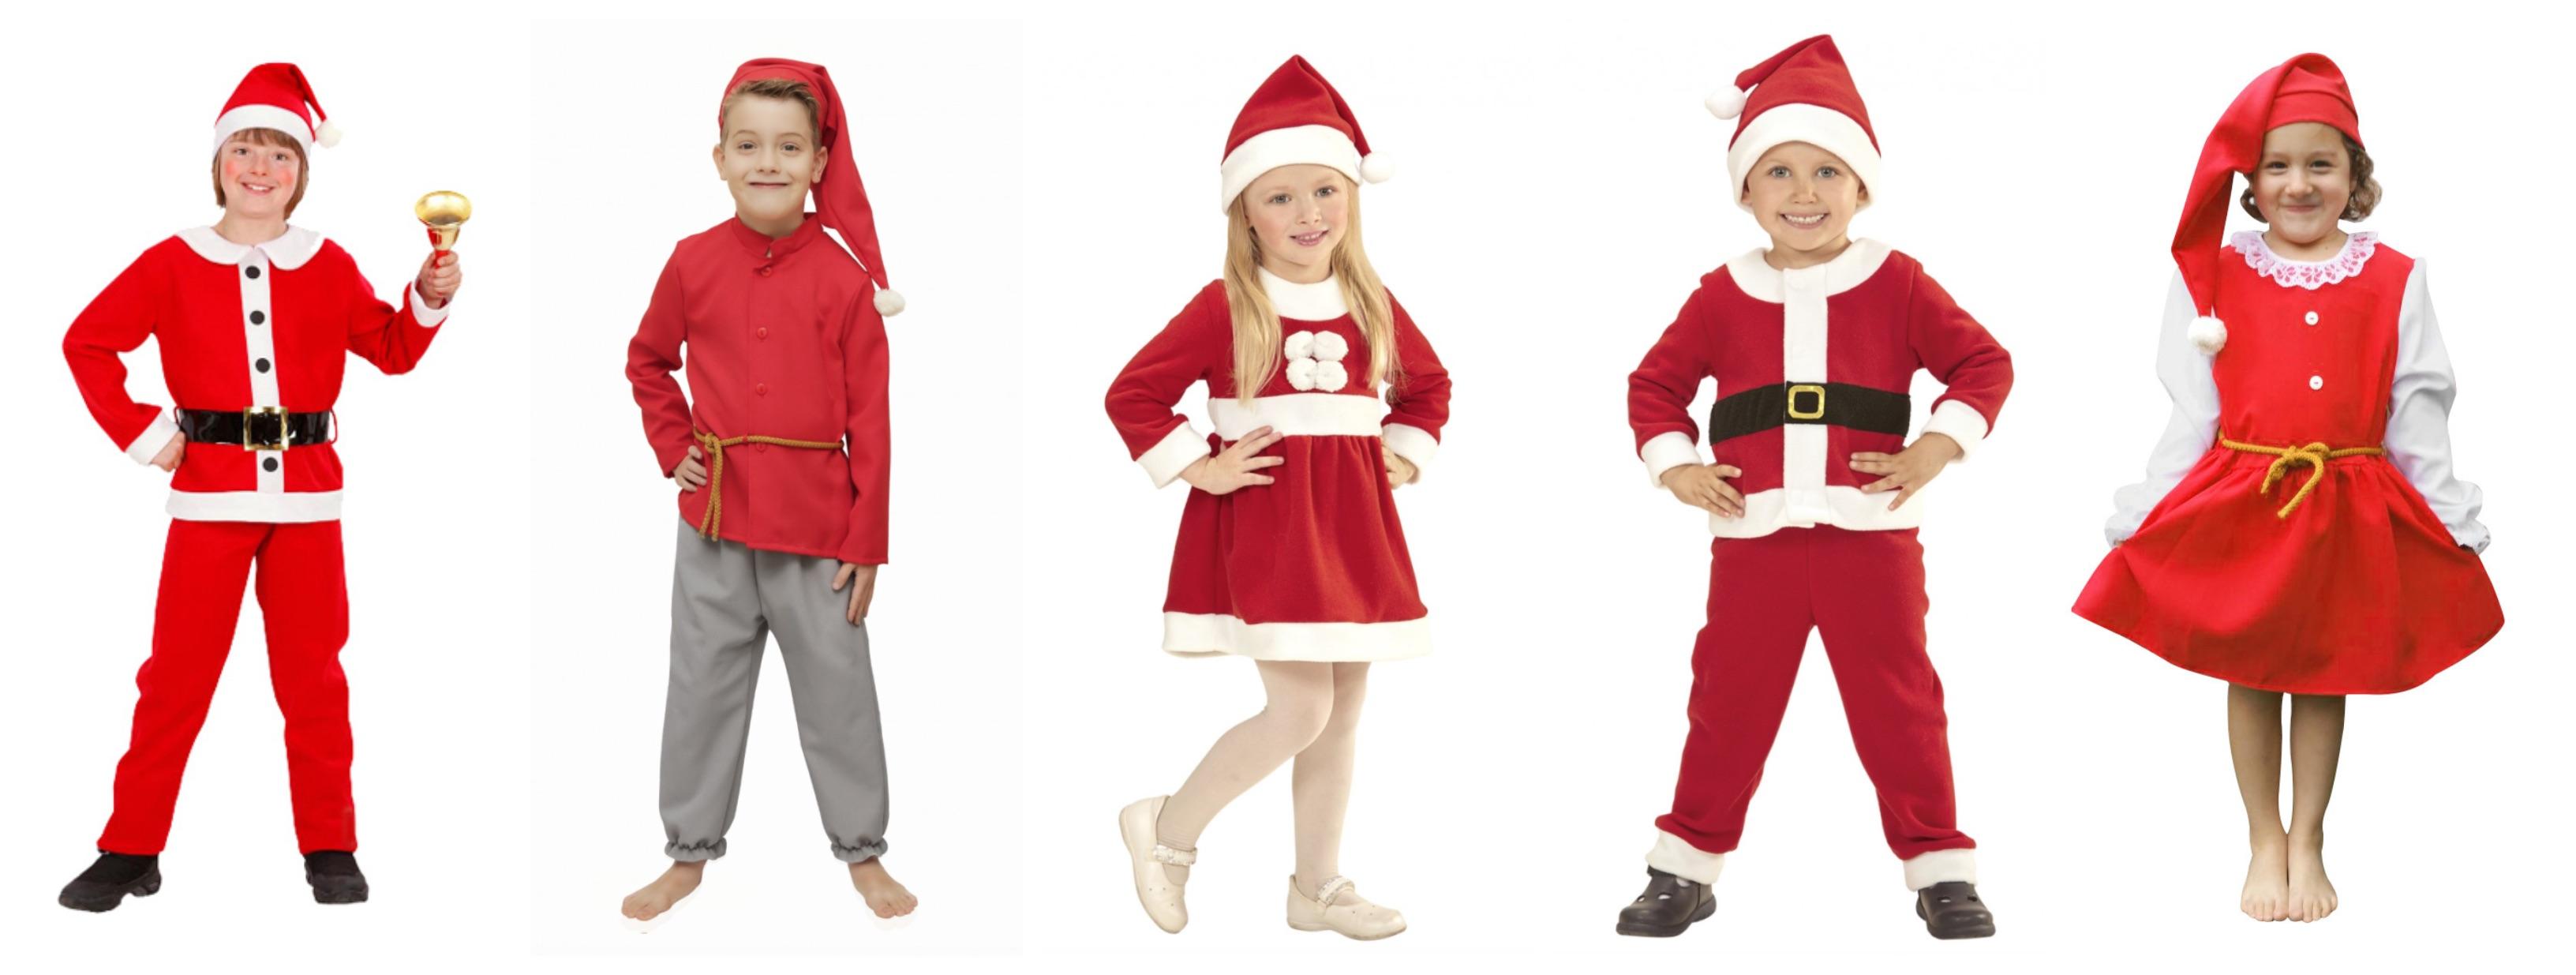 nisse kostume til børn 1 - Nisse kostume til børn